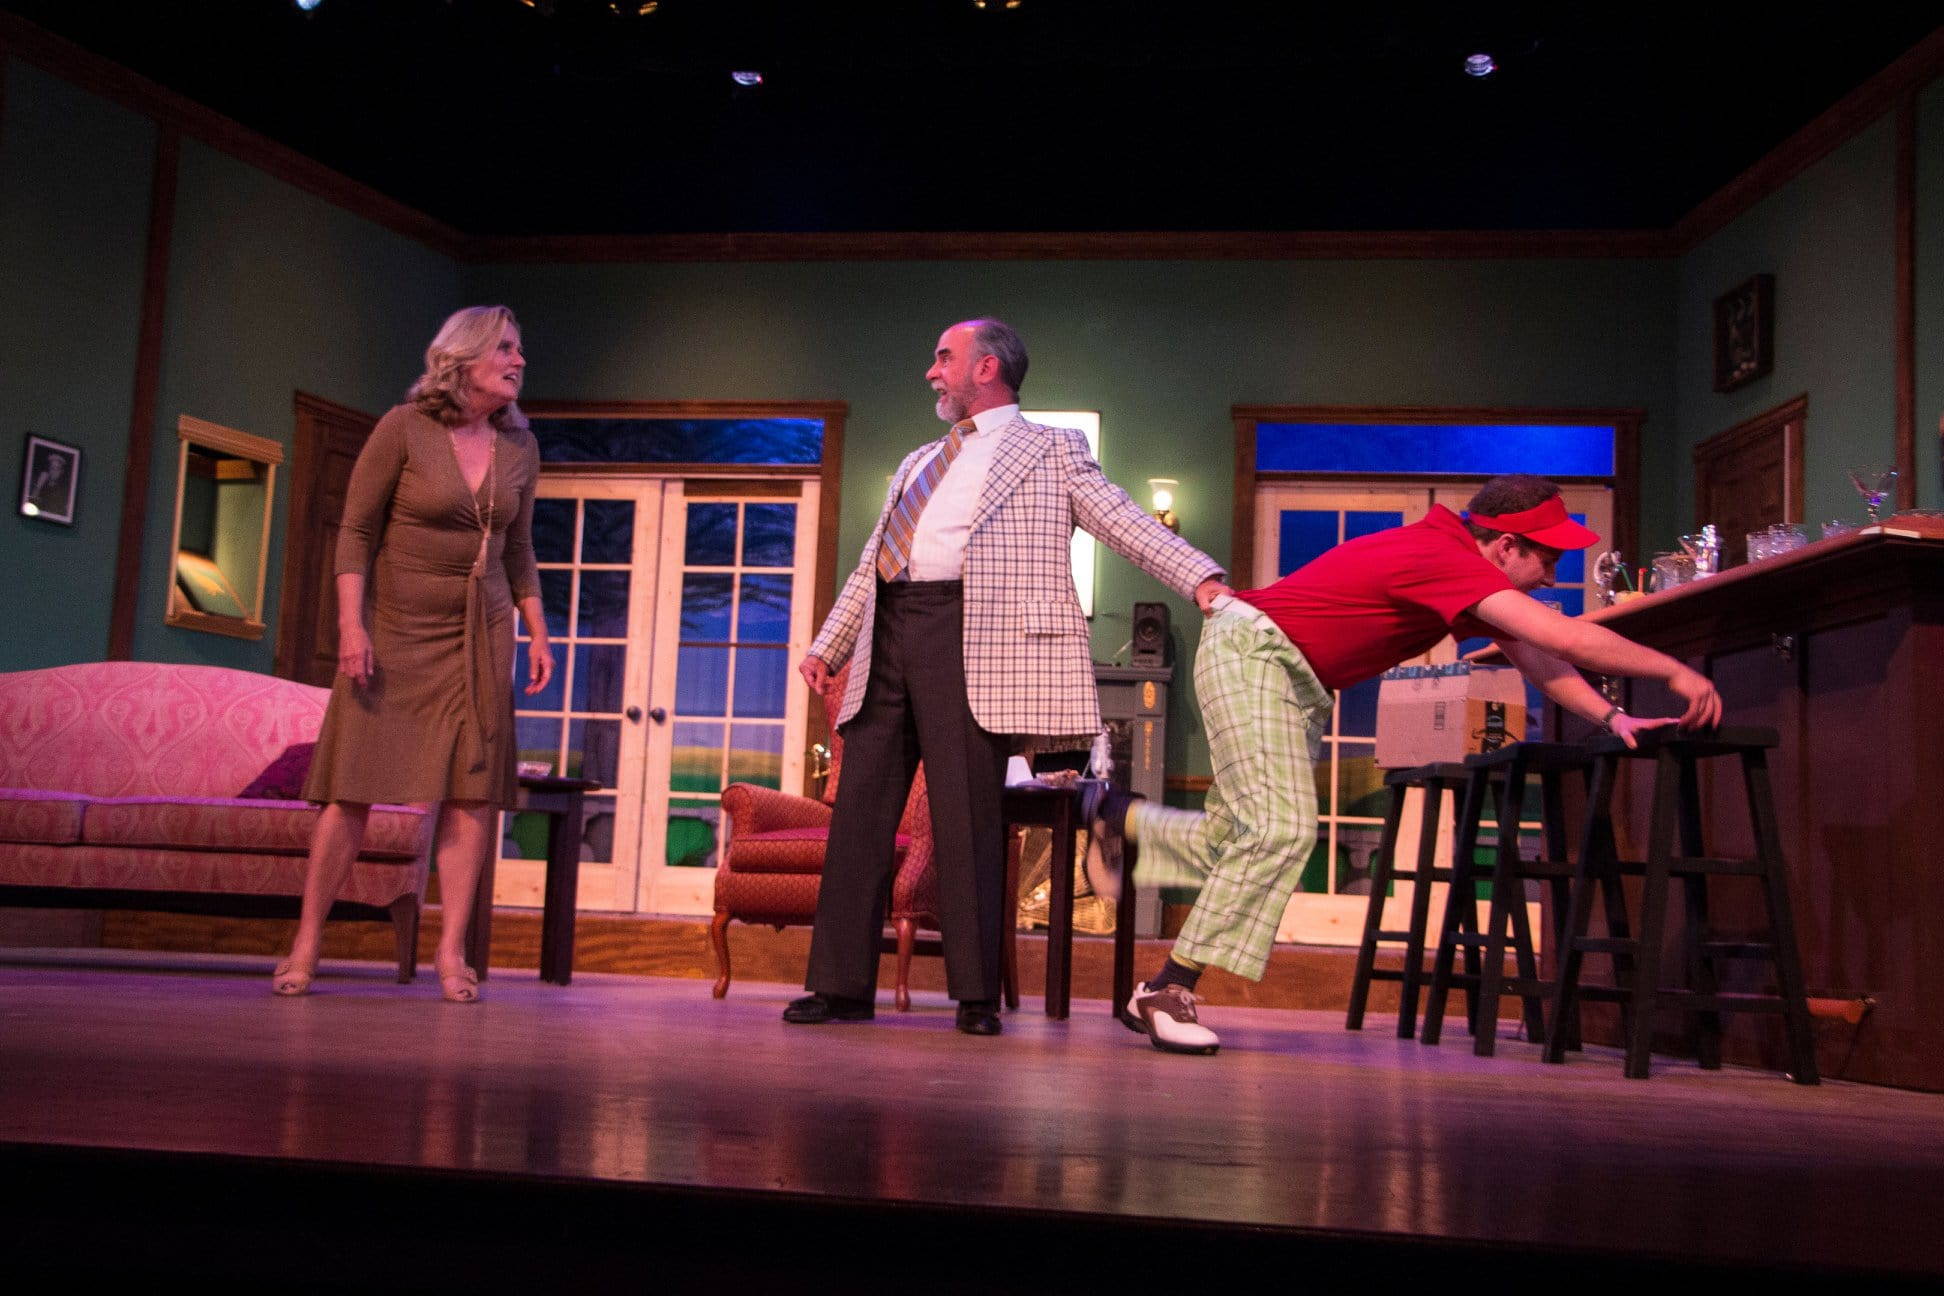 Patricia Nicklin as Pamela Peabody, Ken Kemp as Henry Bingham and Cameron McBride as Justin Hicks in 'A Fox on the Fairway' at Little Theatre of Alexandria. Photo by Matt Liptak.